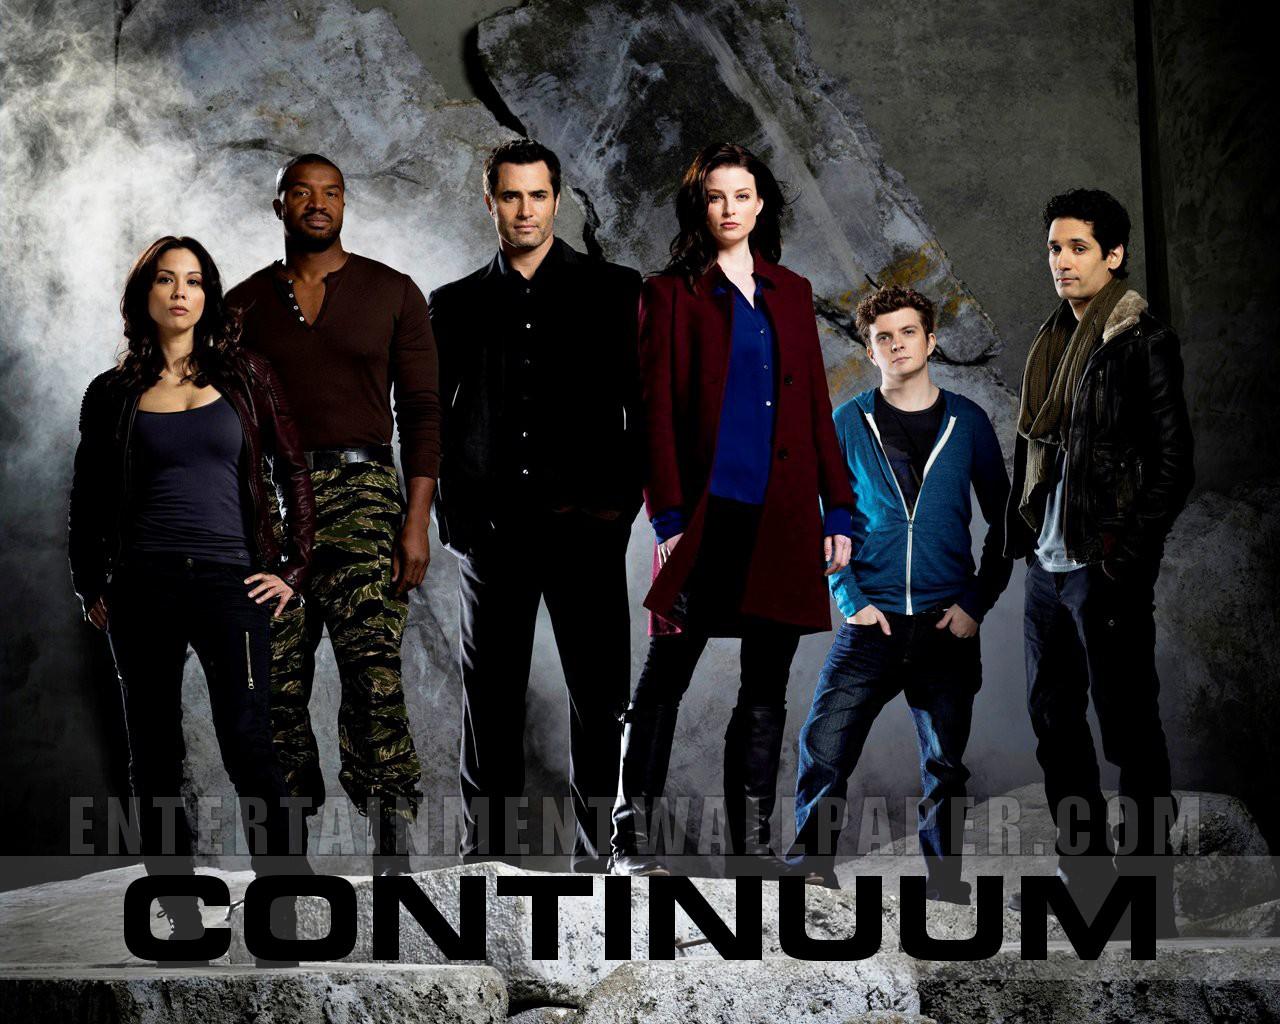 tv show continuum wallpaper 20033483 size 1280x1024 more continuum 1280x1024